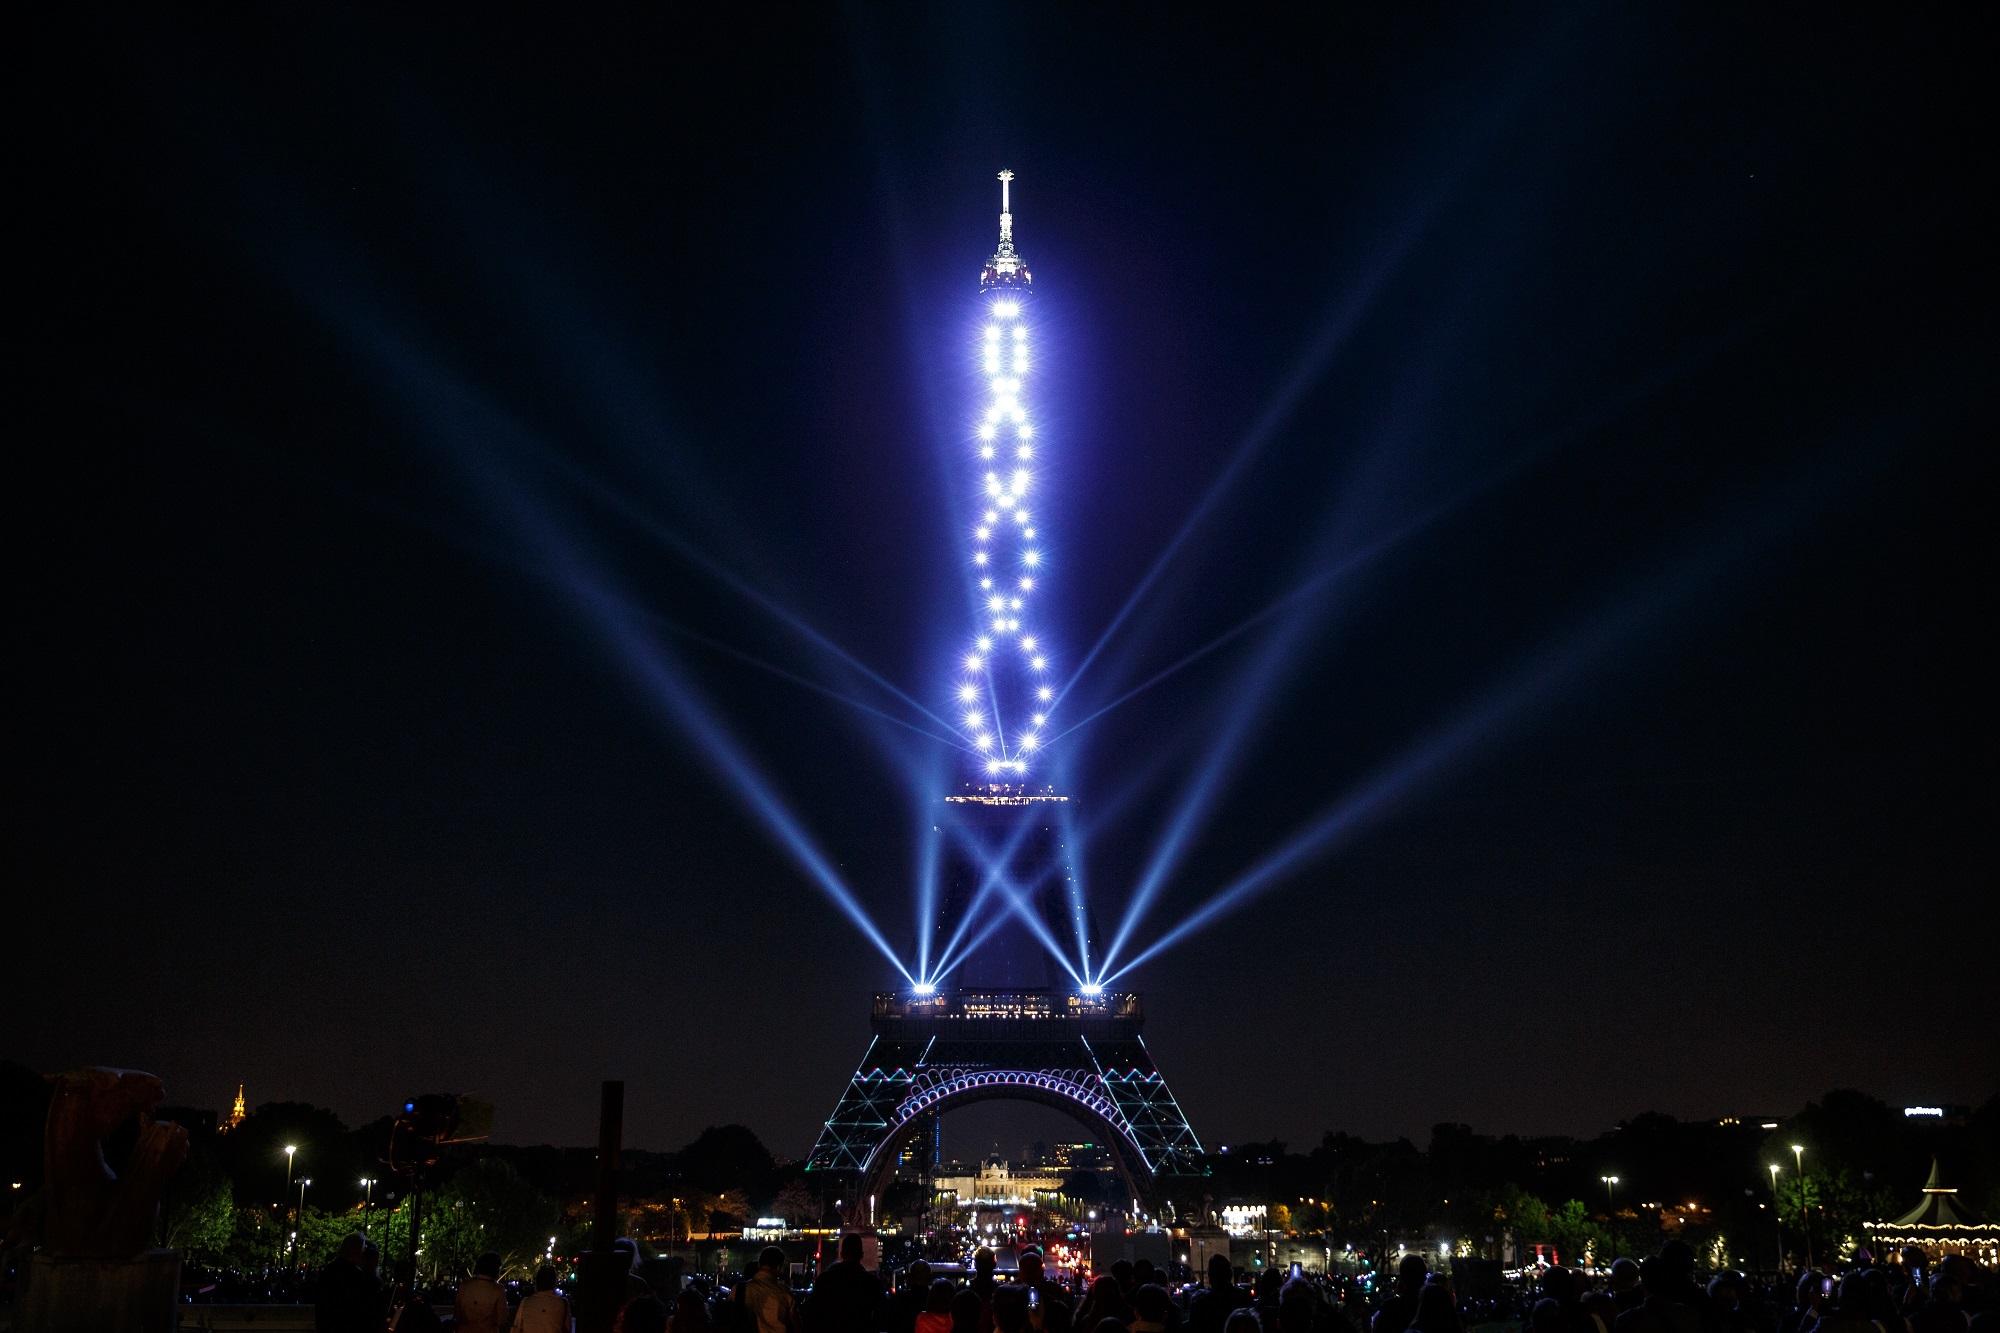 Eiffel Tower 130th Anniversary_22.jpg